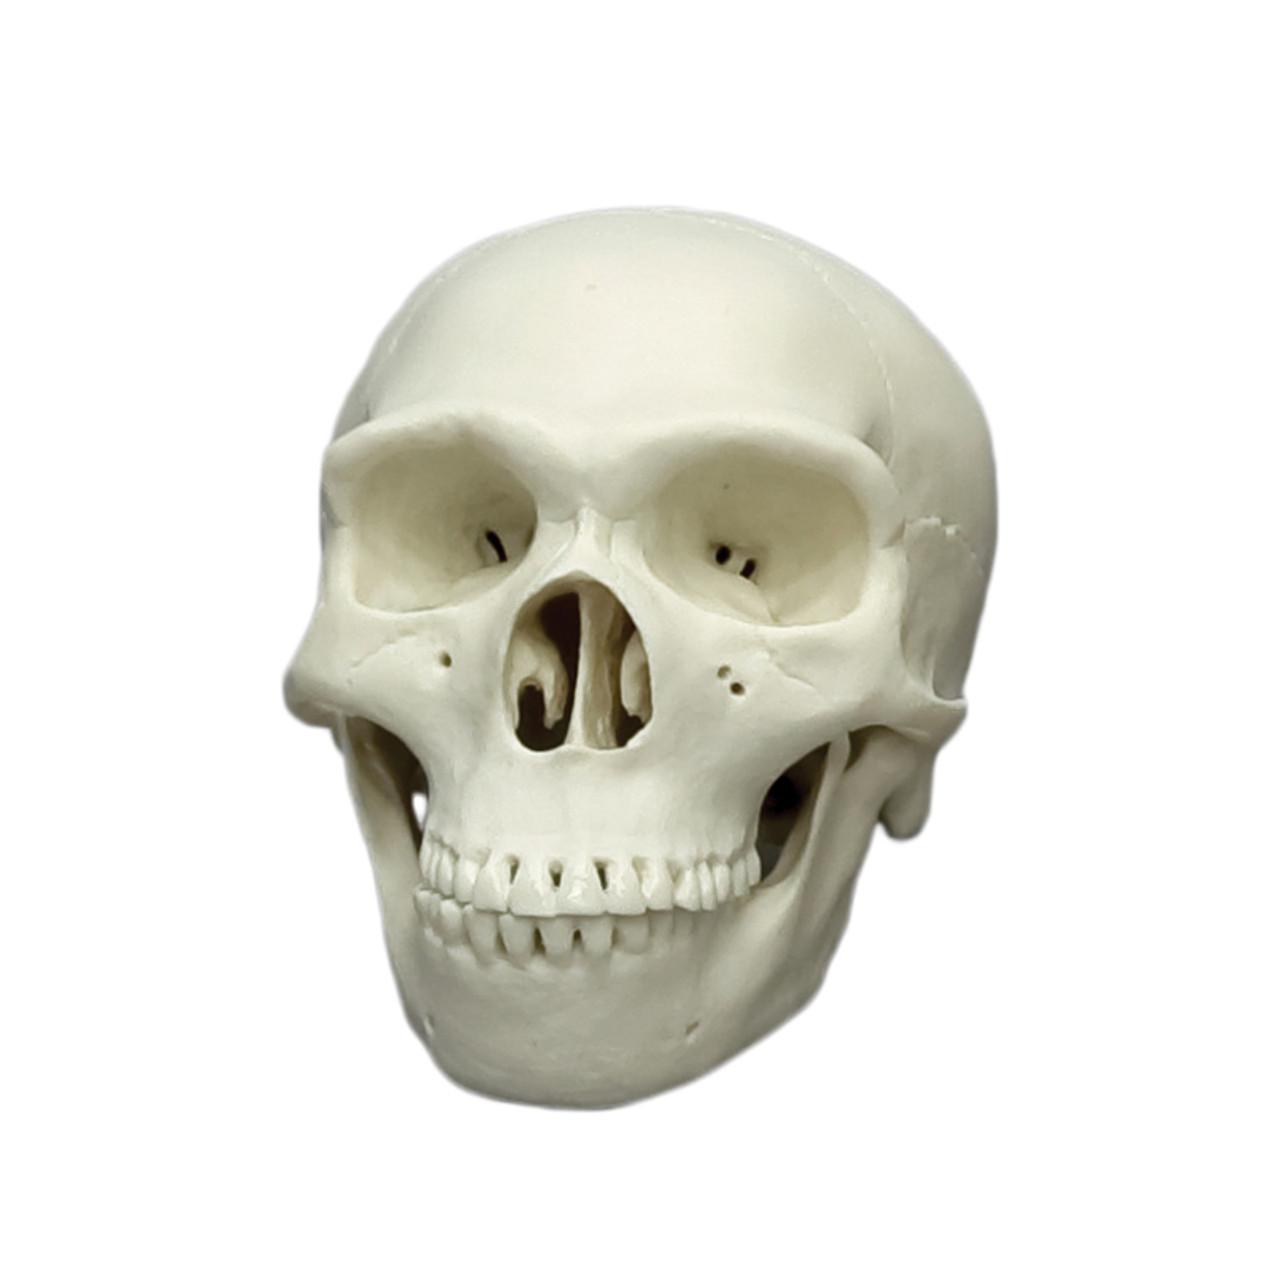 KAM06 - Homo neanderthalensis, half scale